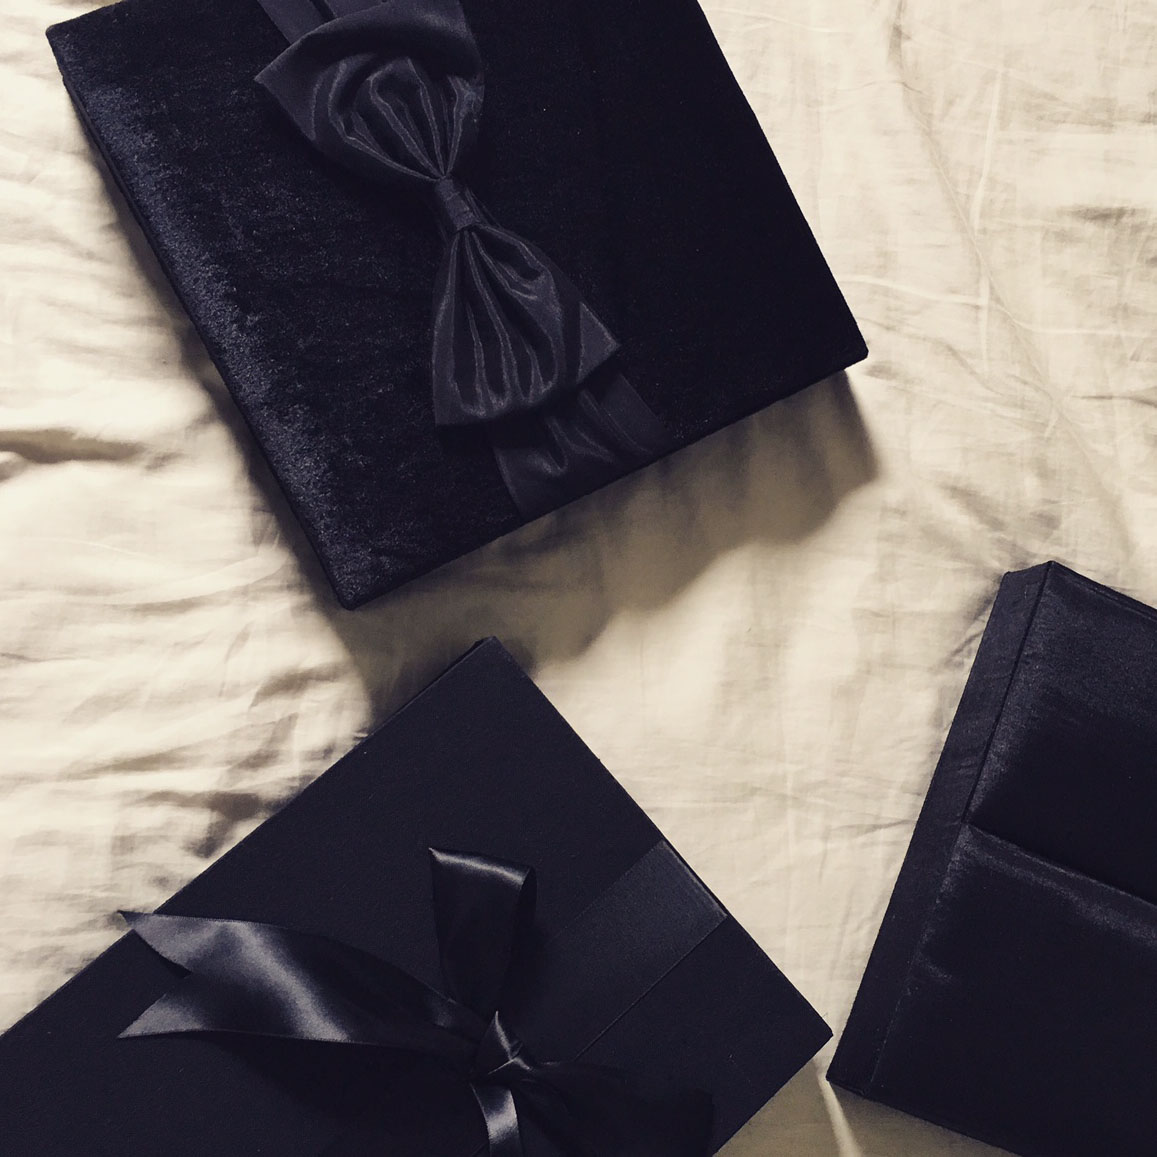 condolence gift boxes